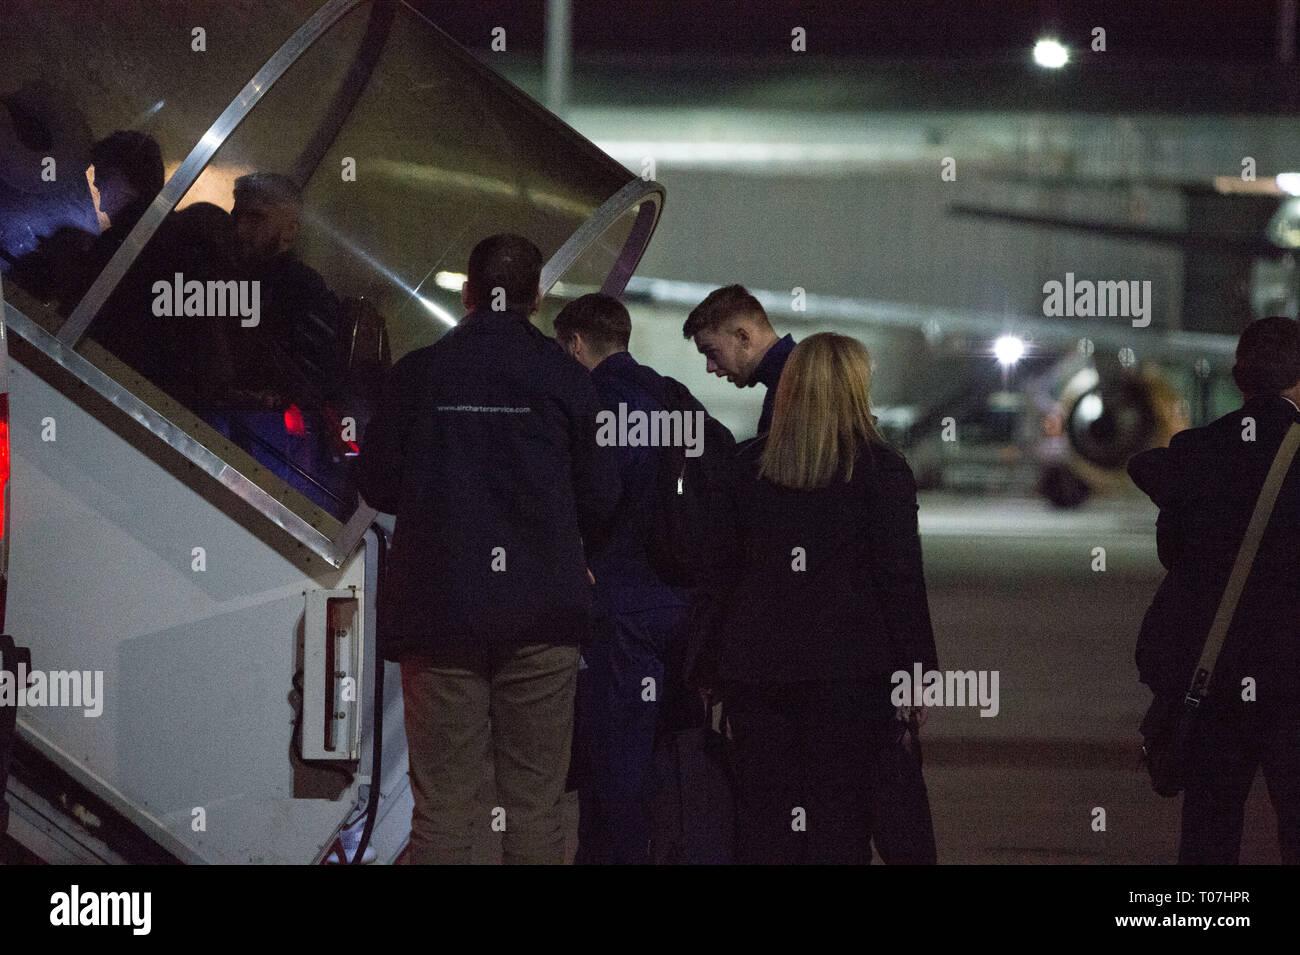 Glasgow International Airport Stock Photos & Glasgow